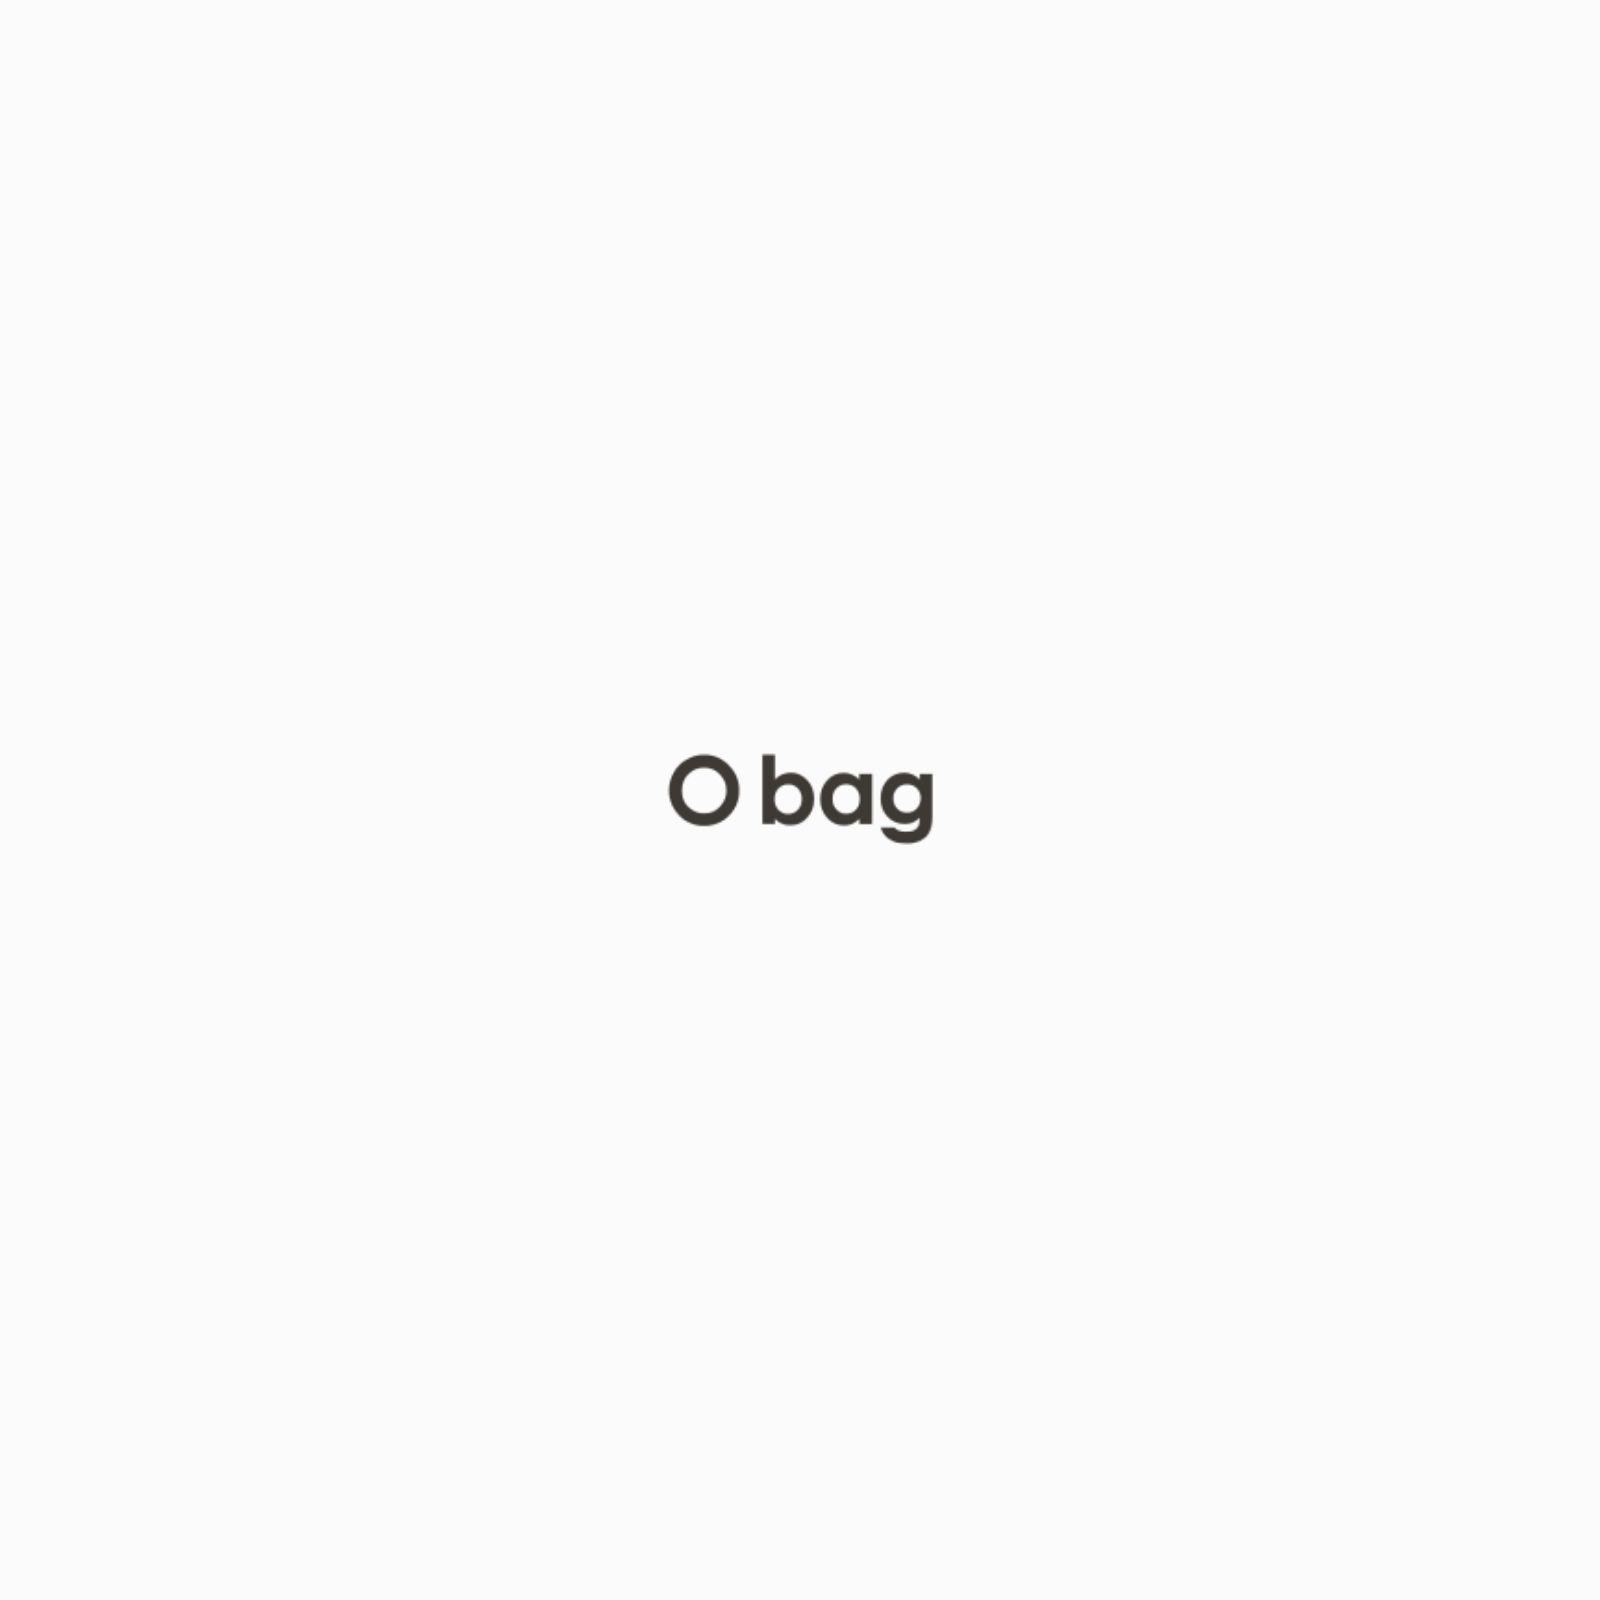 fe3e151a93 O bag O bag soft easy bianca con tracolla stretta gommata